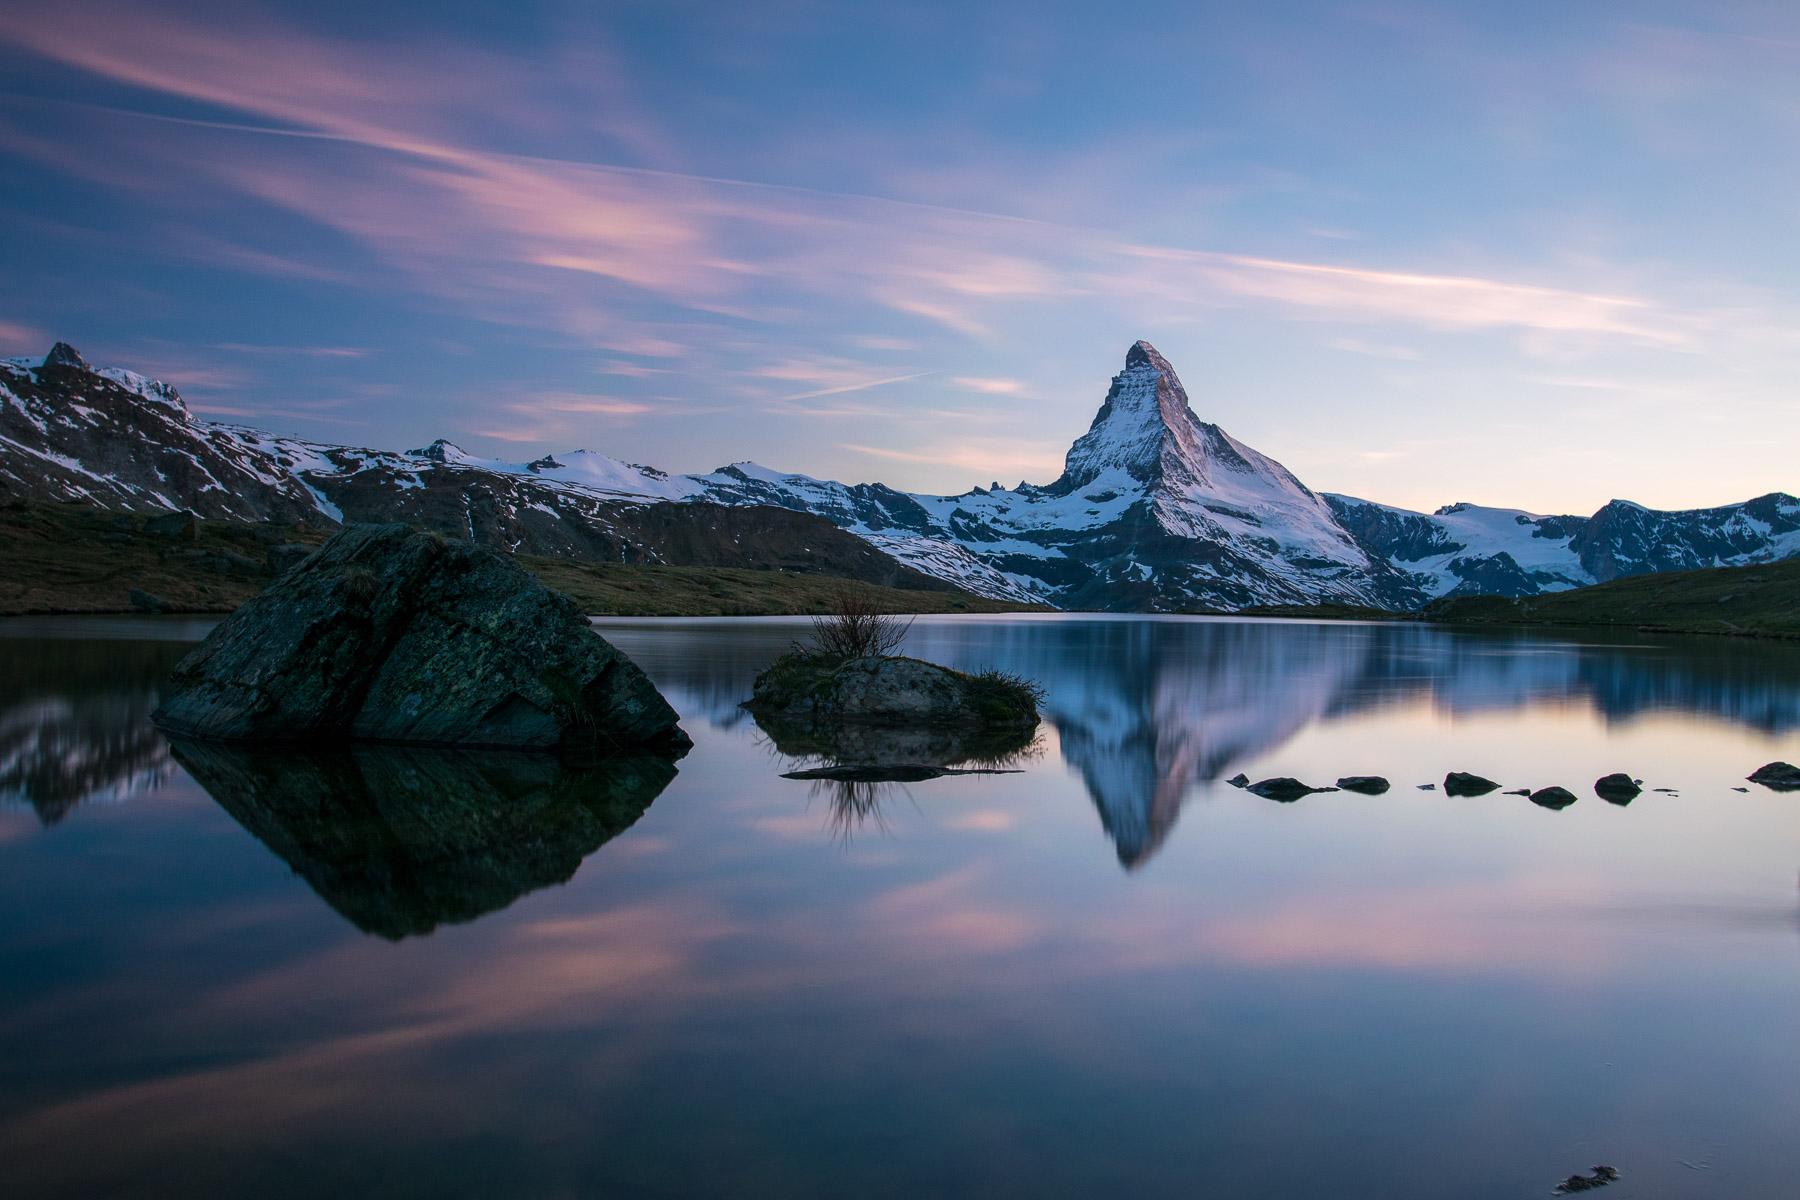 Matterhorn – odrazy vjezeře Stellisee